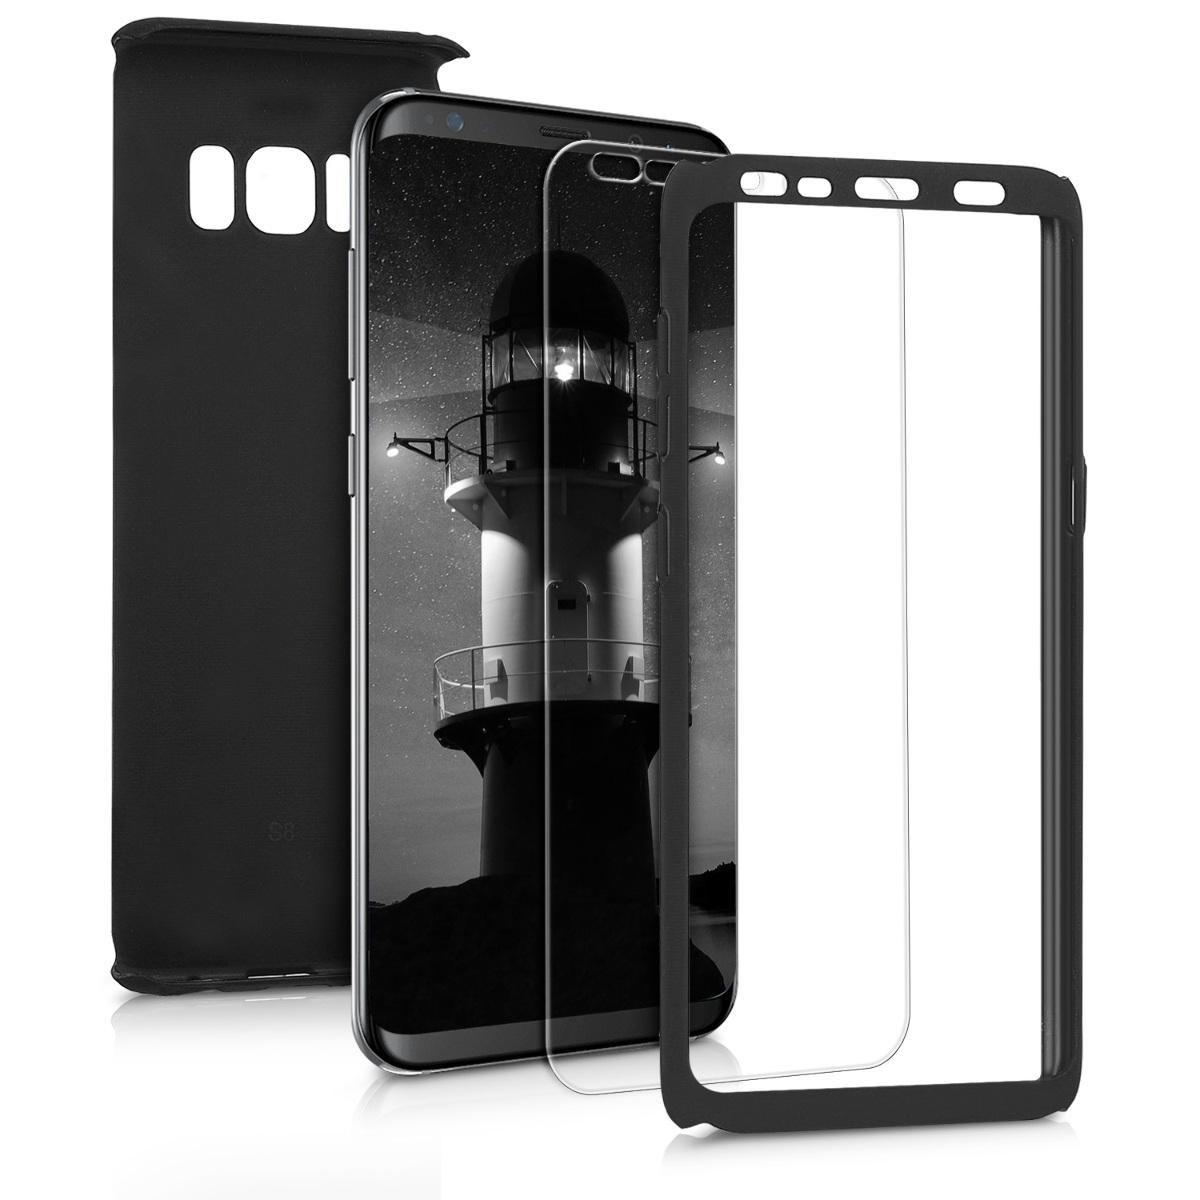 KW Θήκη Full Body για Samsung Galaxy S8 & Screen Protector - Metallic Black (43781.68)